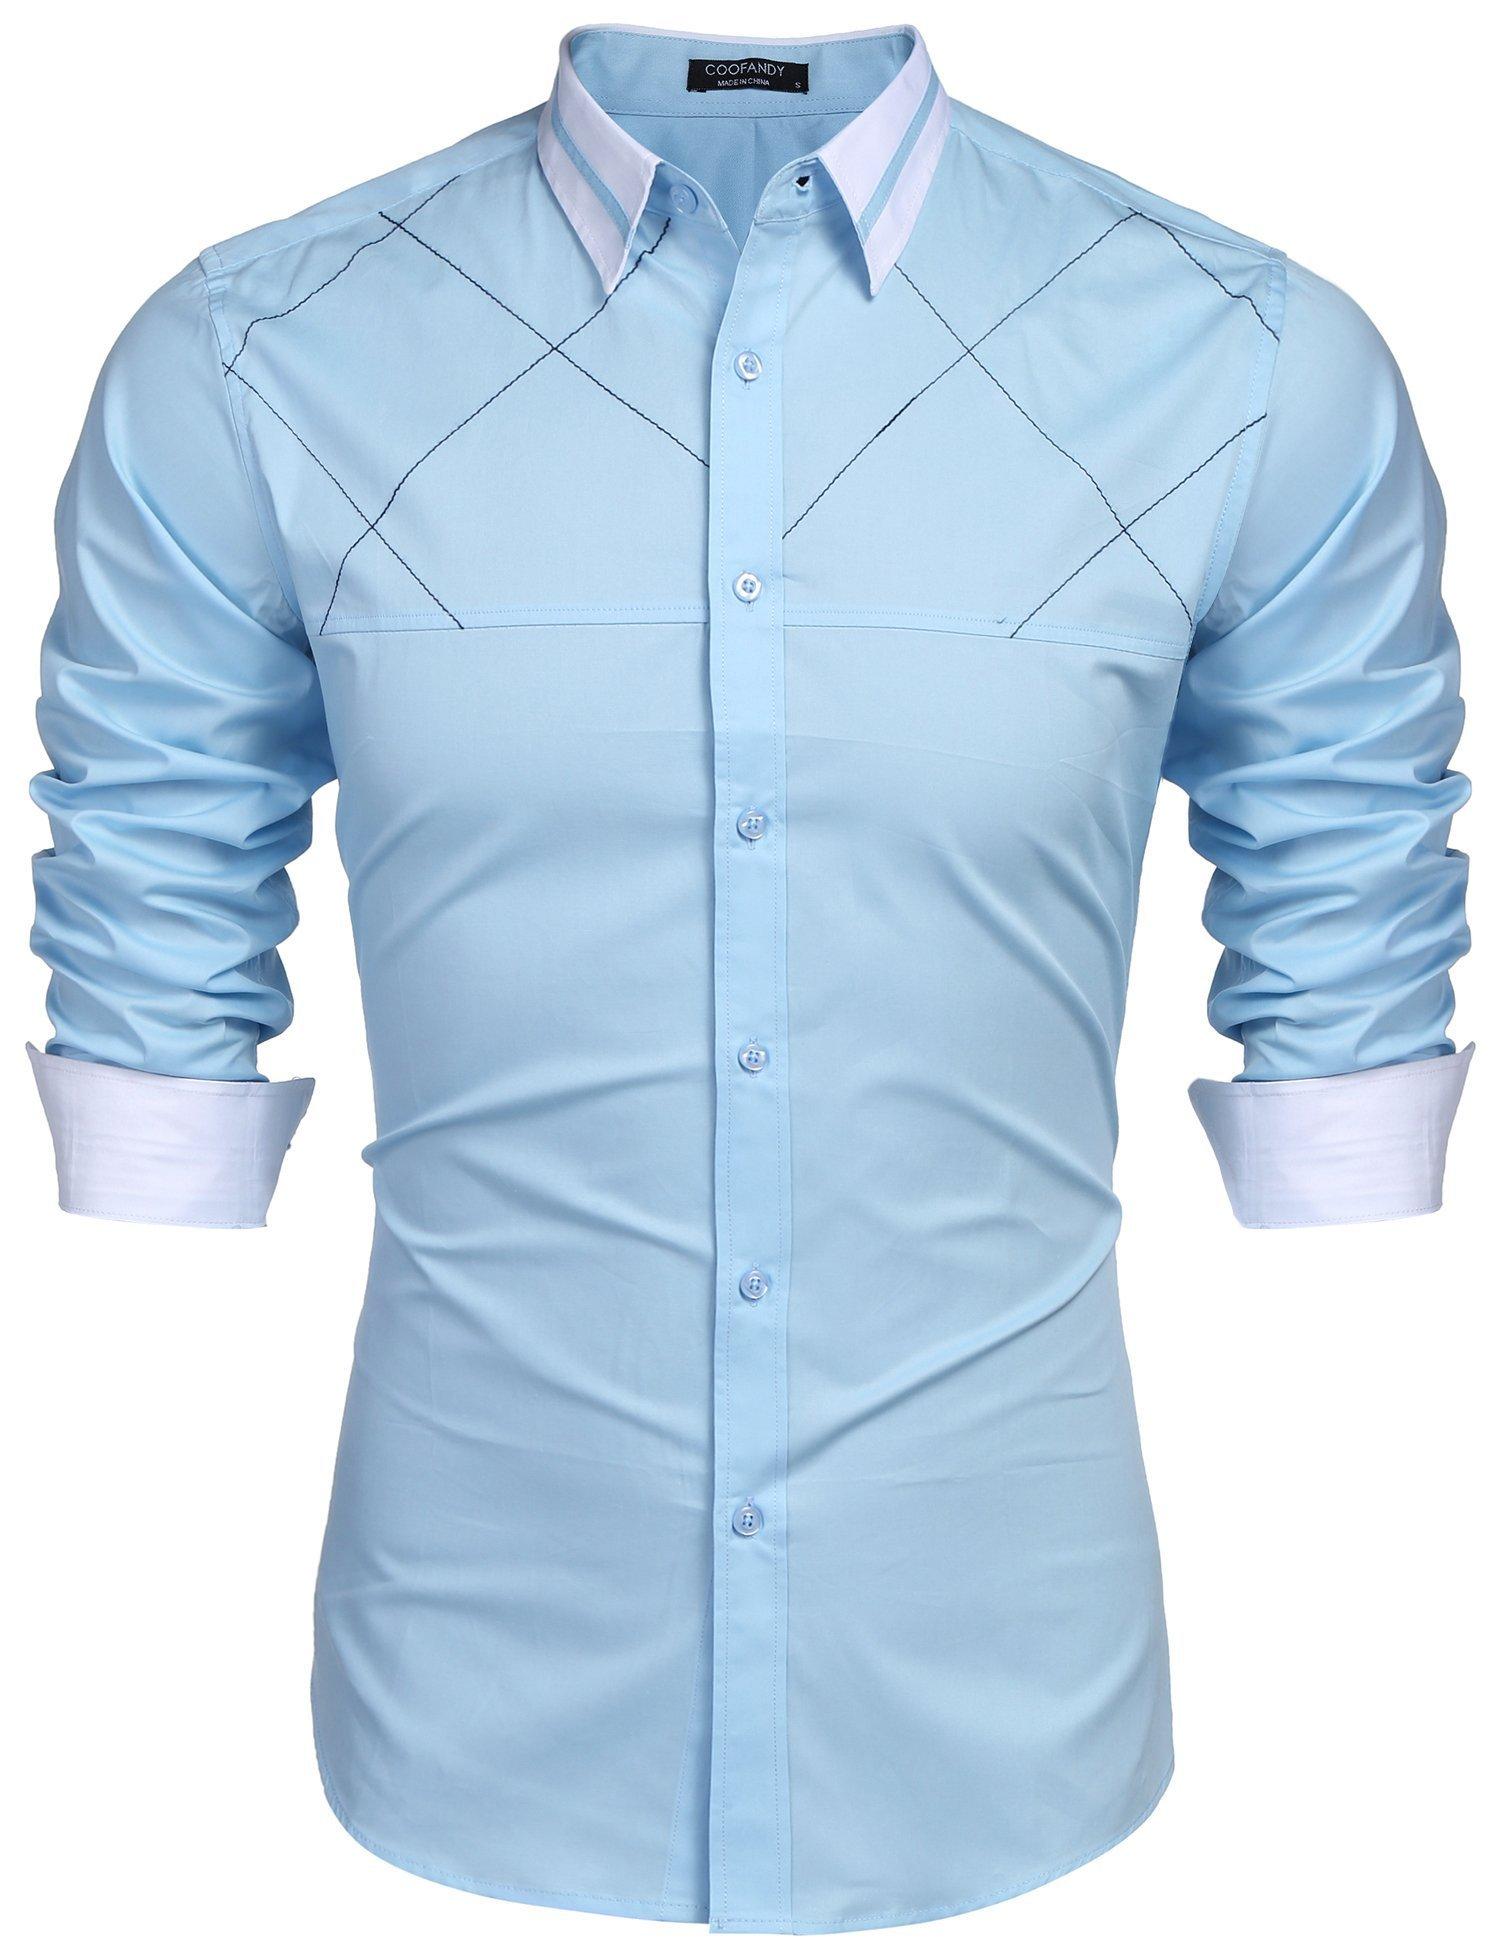 COOFANDY Men's Classic Slim Fit Dress Shirt Collar Neck Contrast Color Casual Button Down Shirts,Blue,Medium